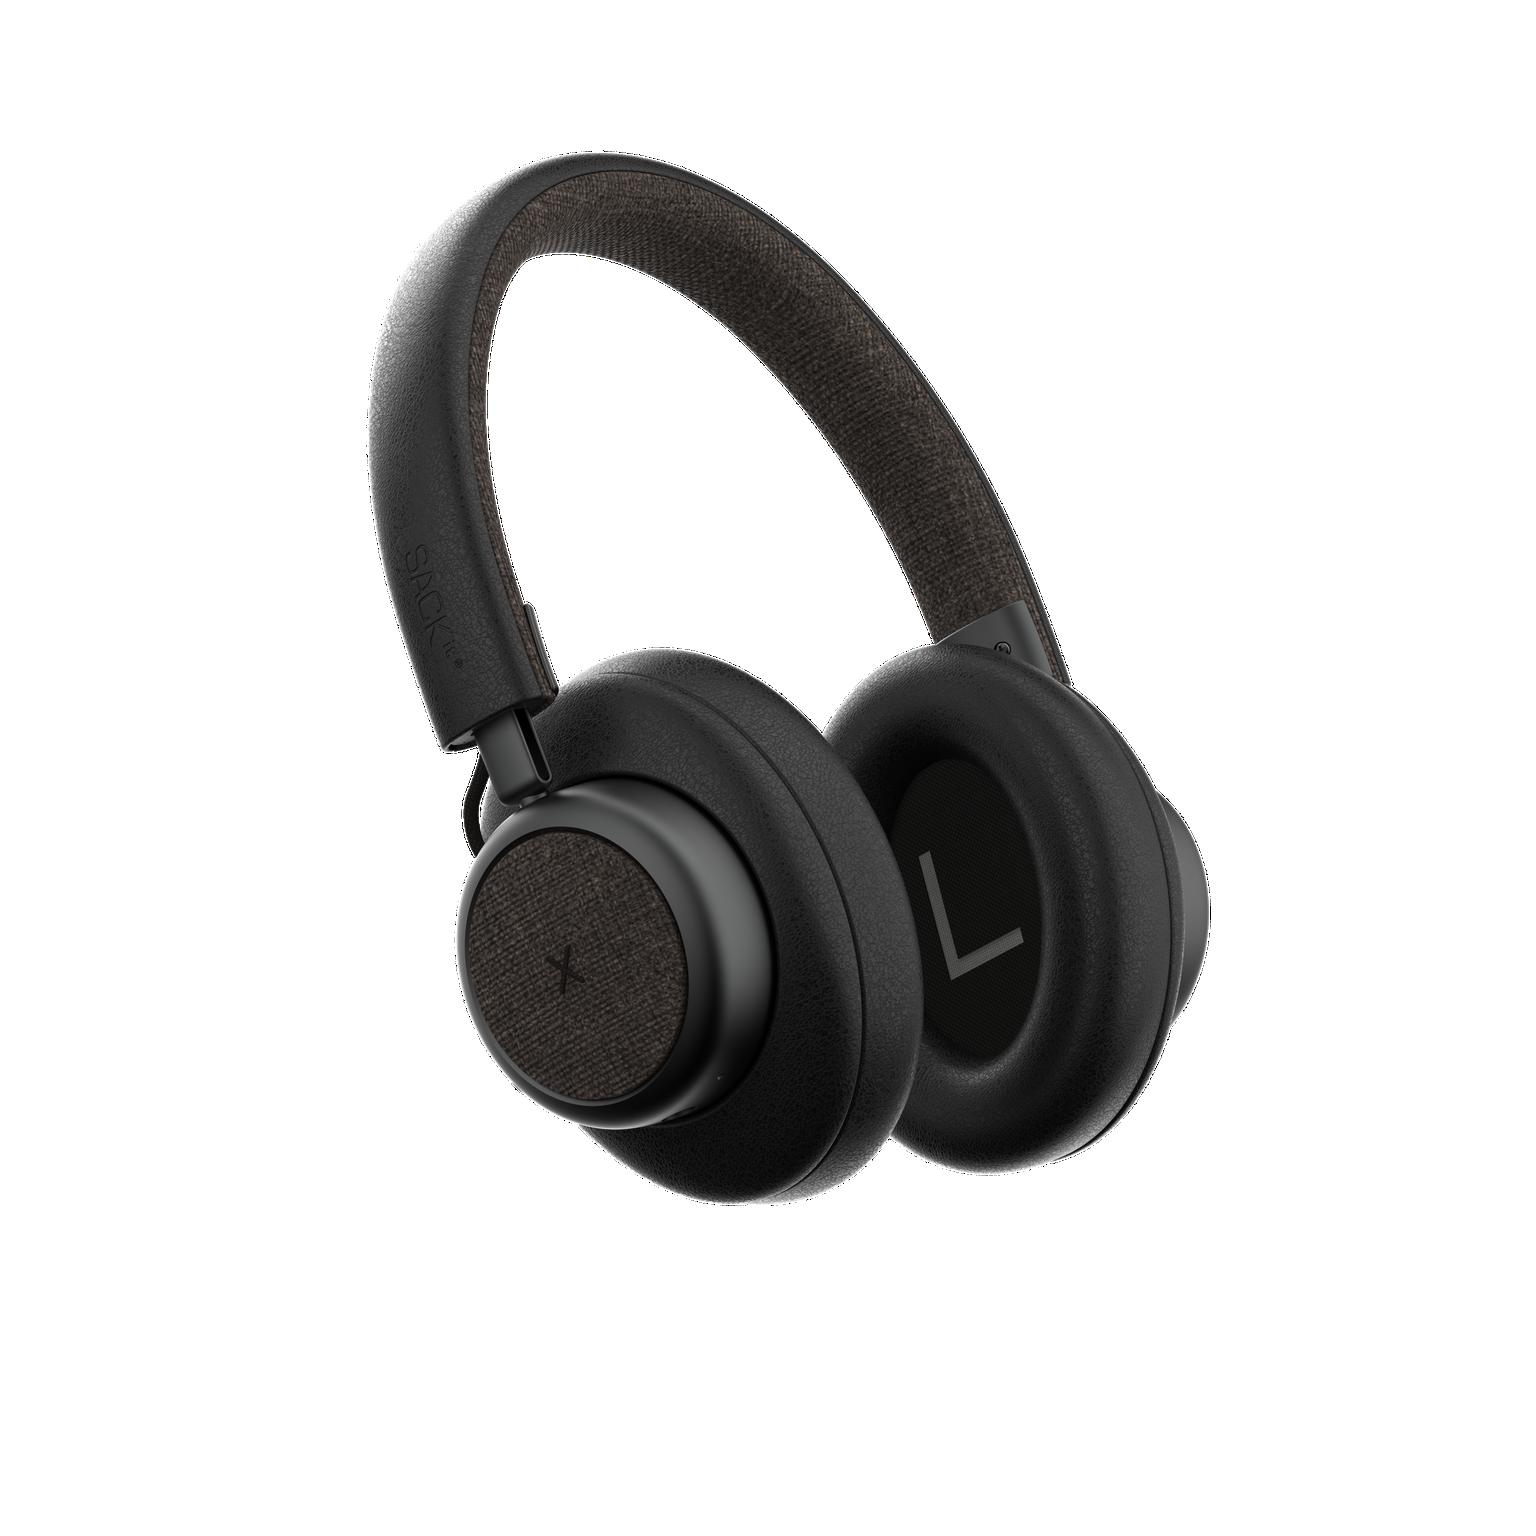 SACKit - TOUCHit Over-Ear Headphones - Black